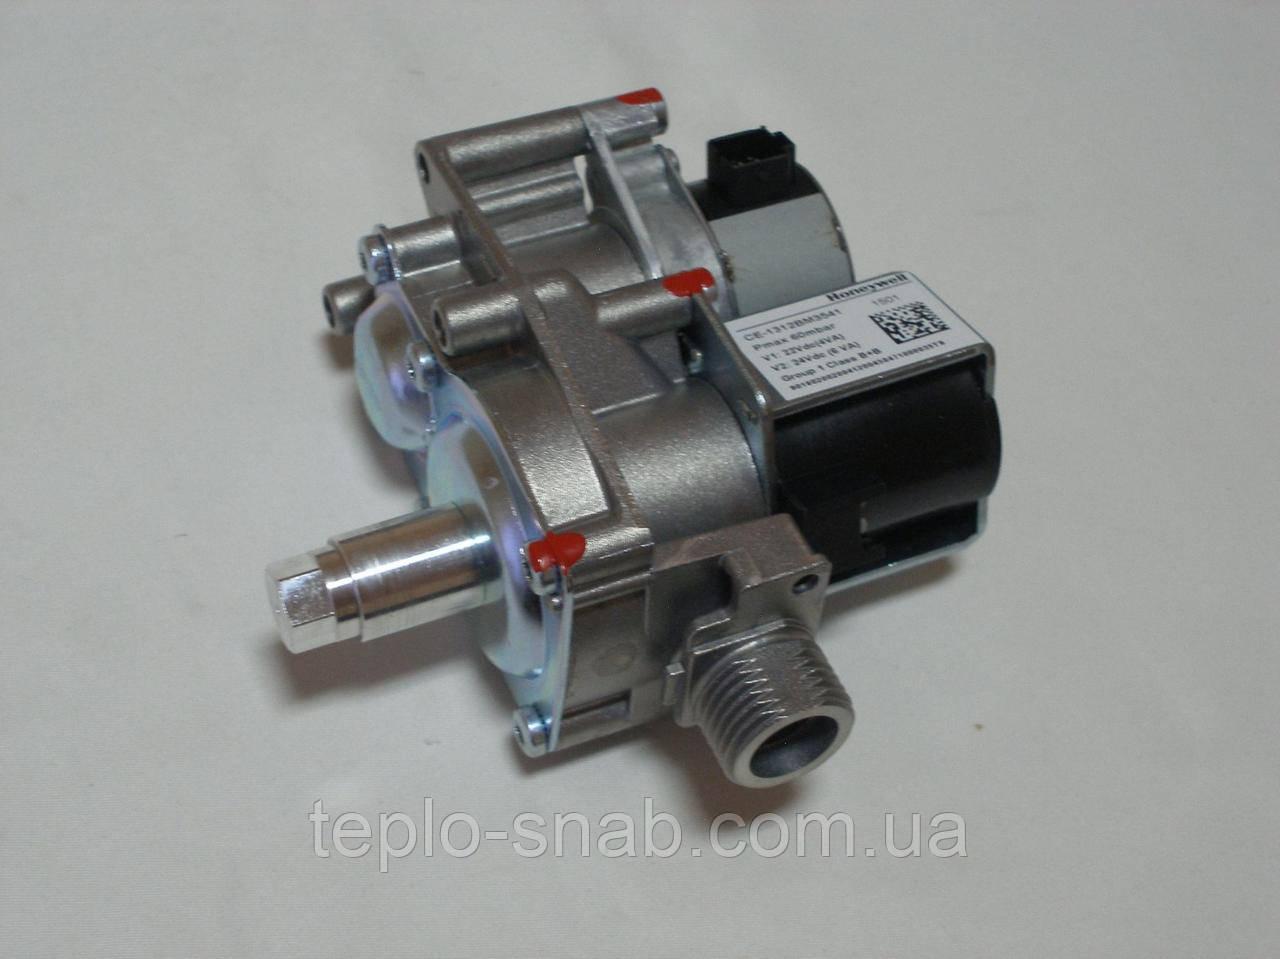 Газовый клапан Renova Star, SAUNIER DUVAL Thema Classic, Combitek. S1071600 (Honeywell VK8525MR1501U)